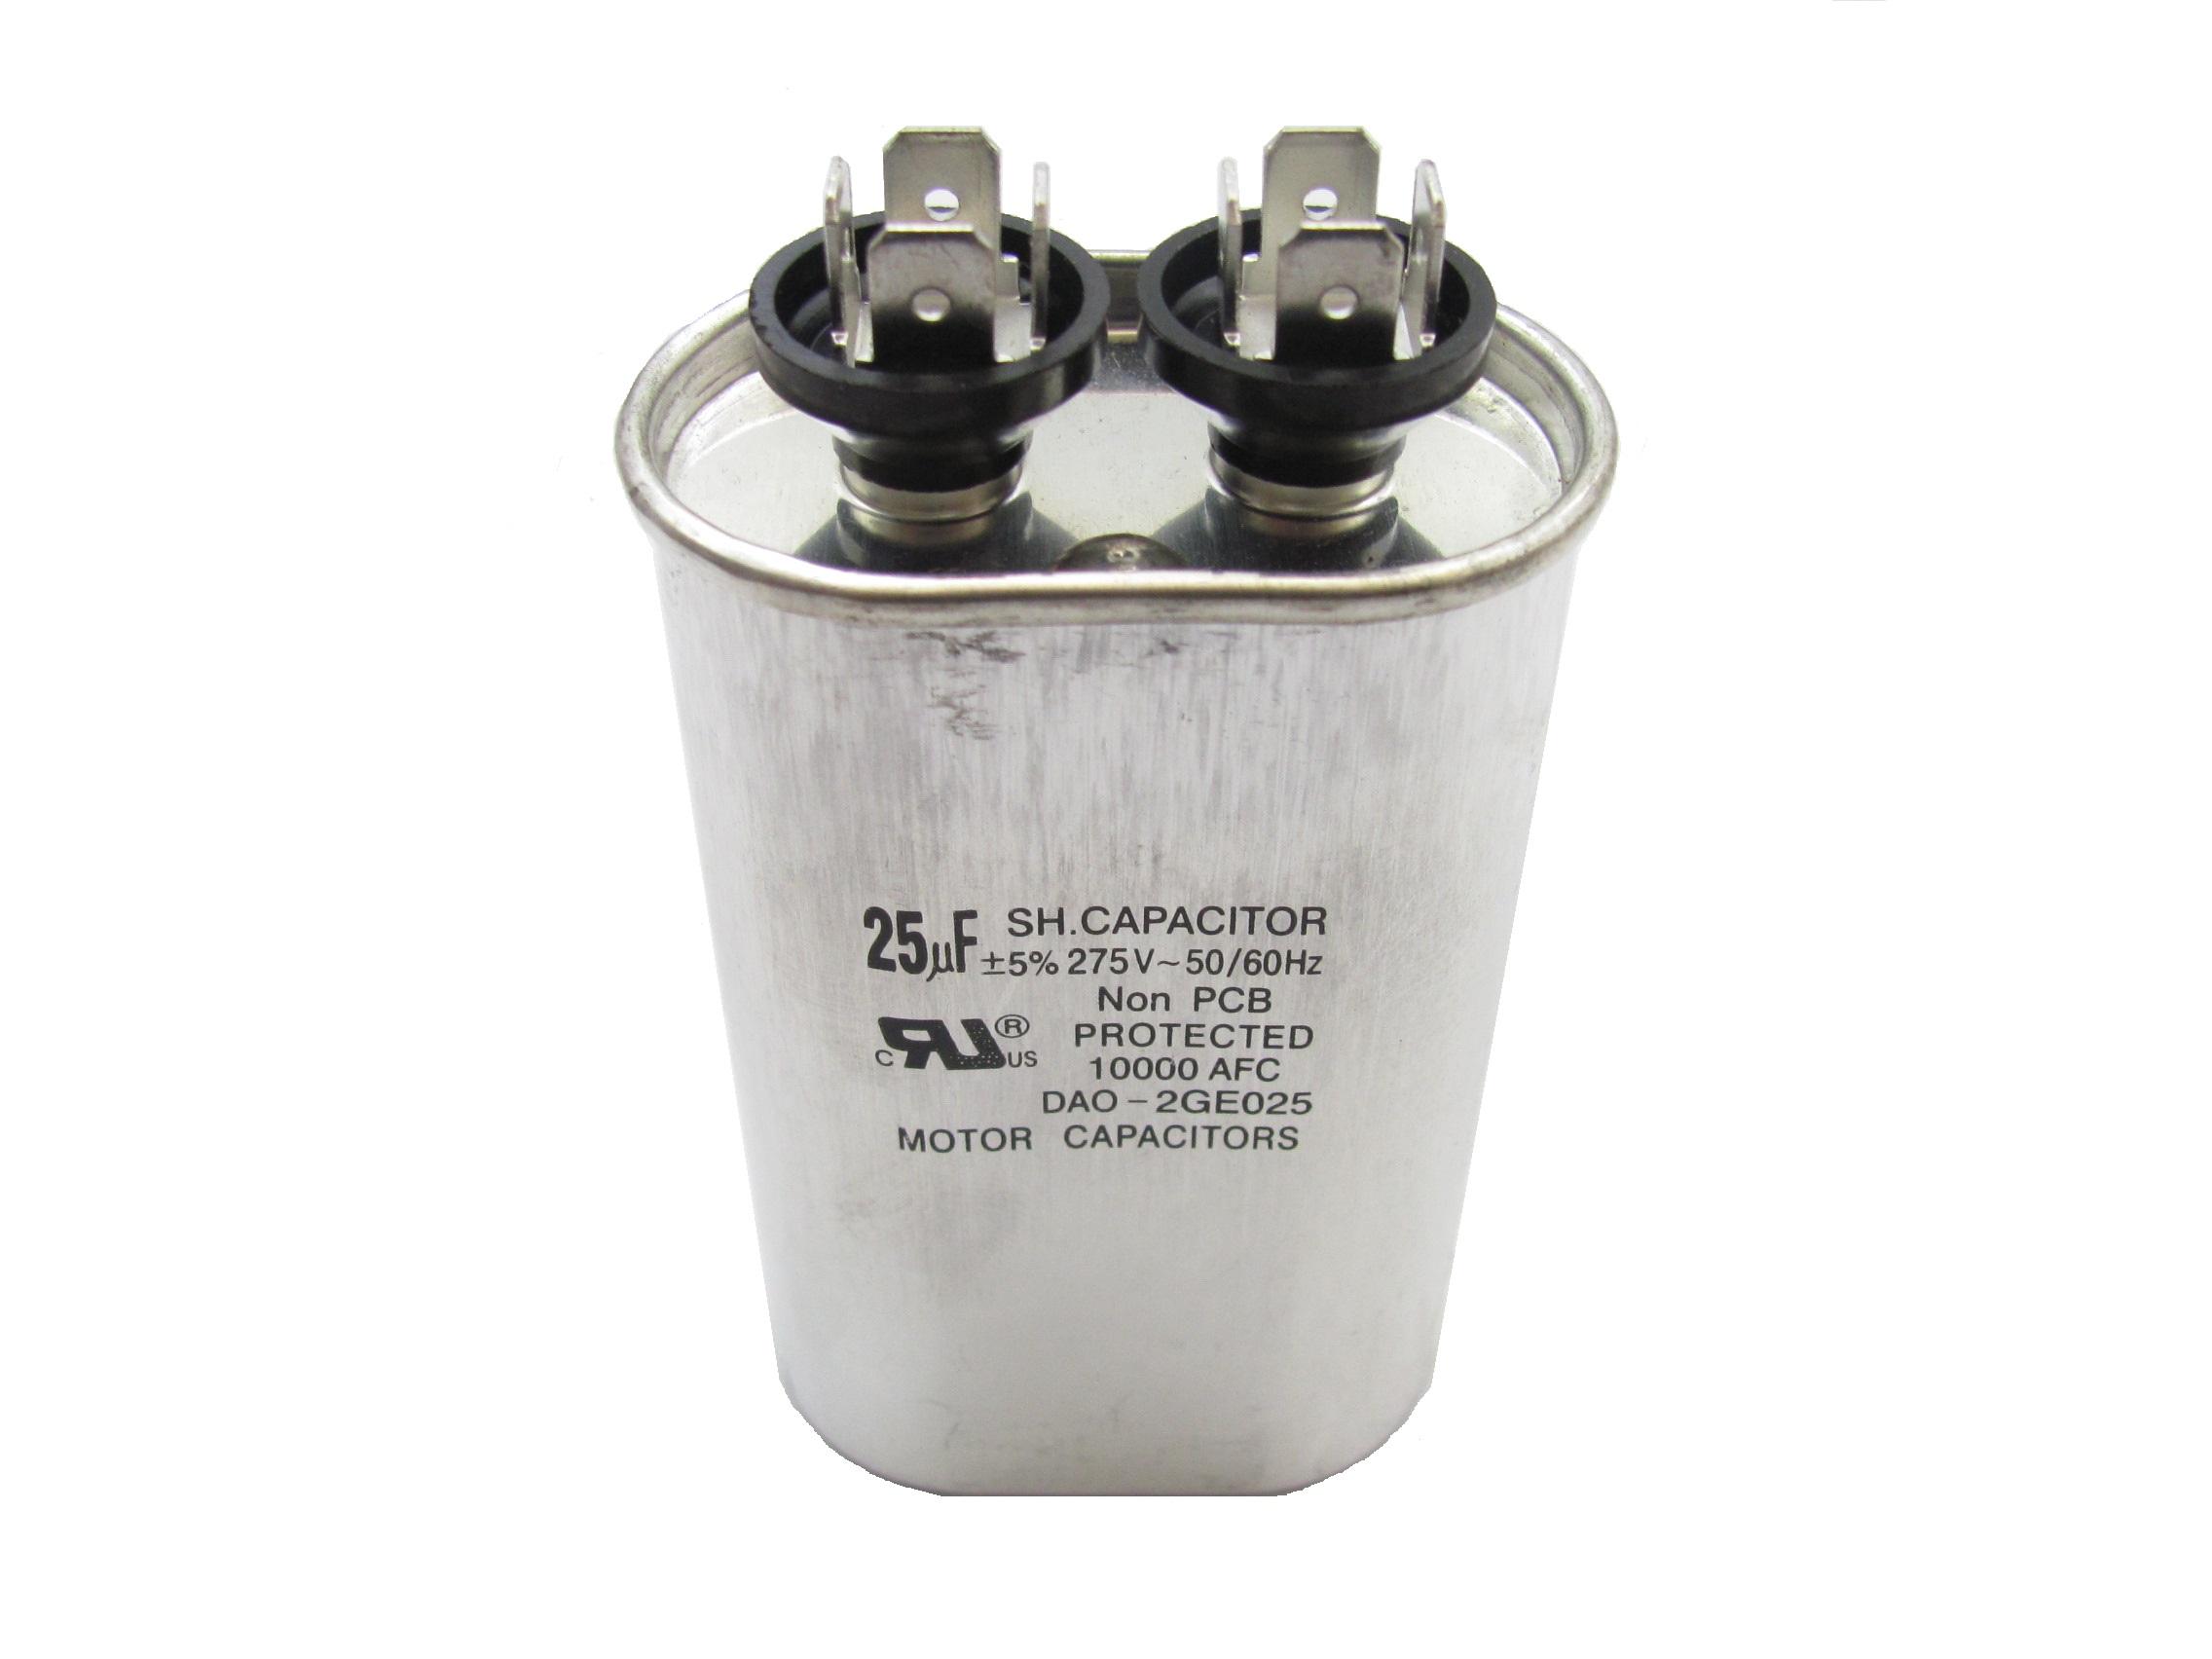 DAO / DAL Motor Run Capacitors